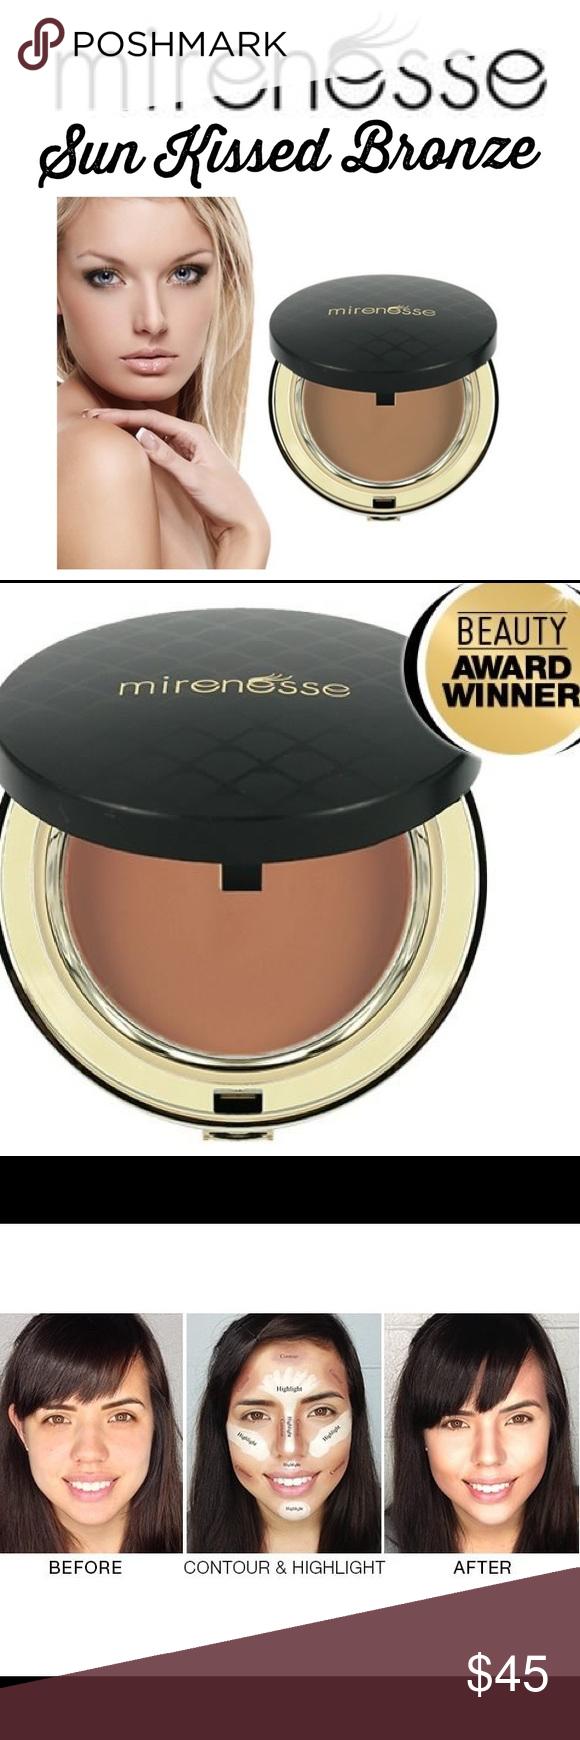 Mirenesse Skin Clone Mineral Veil Sunkissed Bronze A 2in